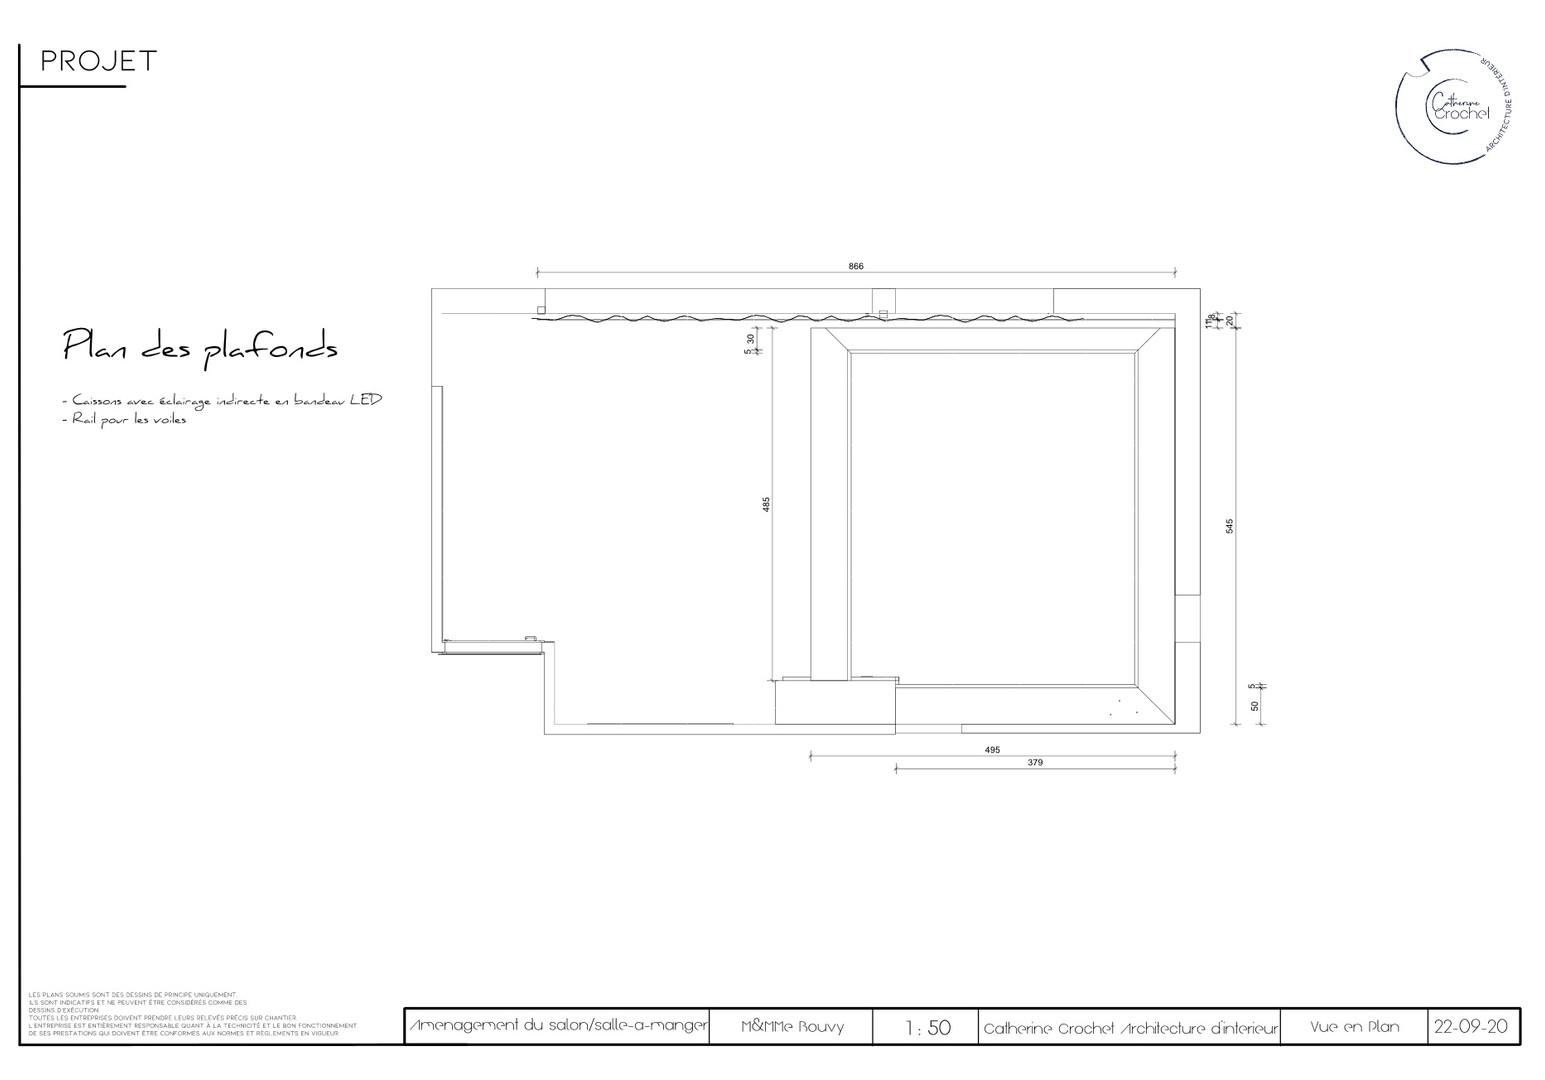 C-projet-salon-sàm-plan de plafond